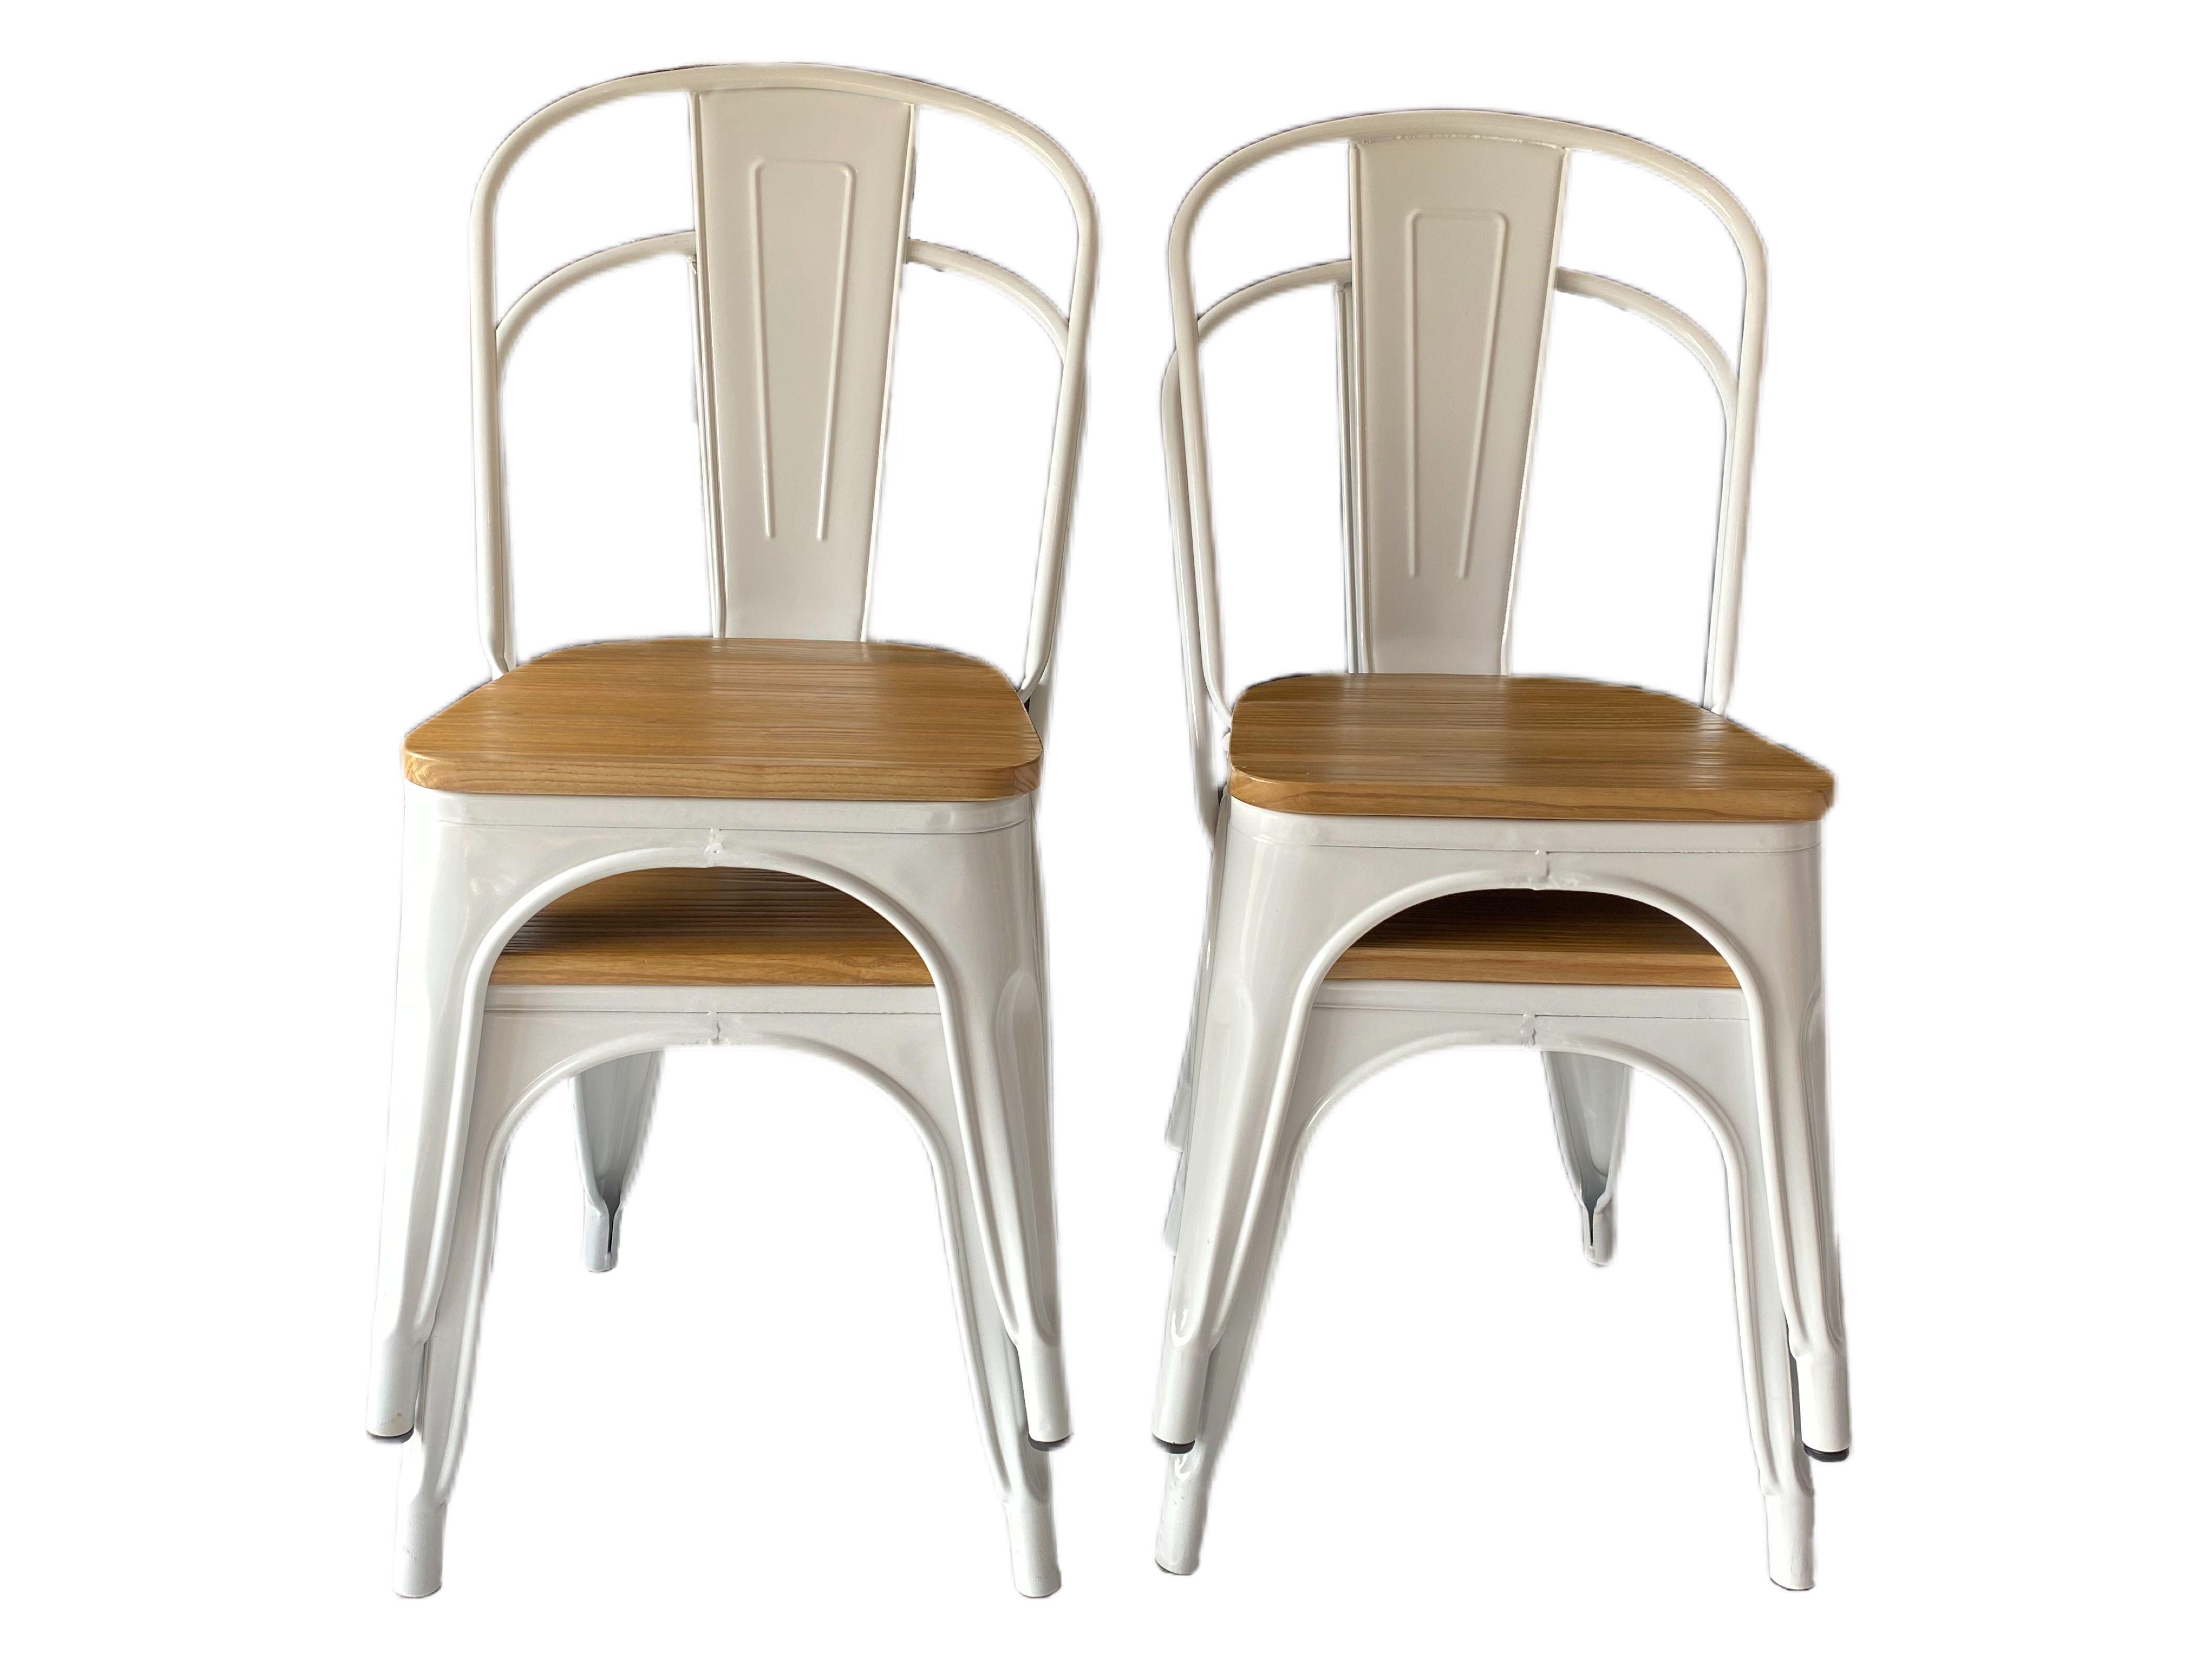 Pack 4x Chaises Industriel Blanche Assise Bois En 2020 Chaise Metal Chaise Industrielle Chaise